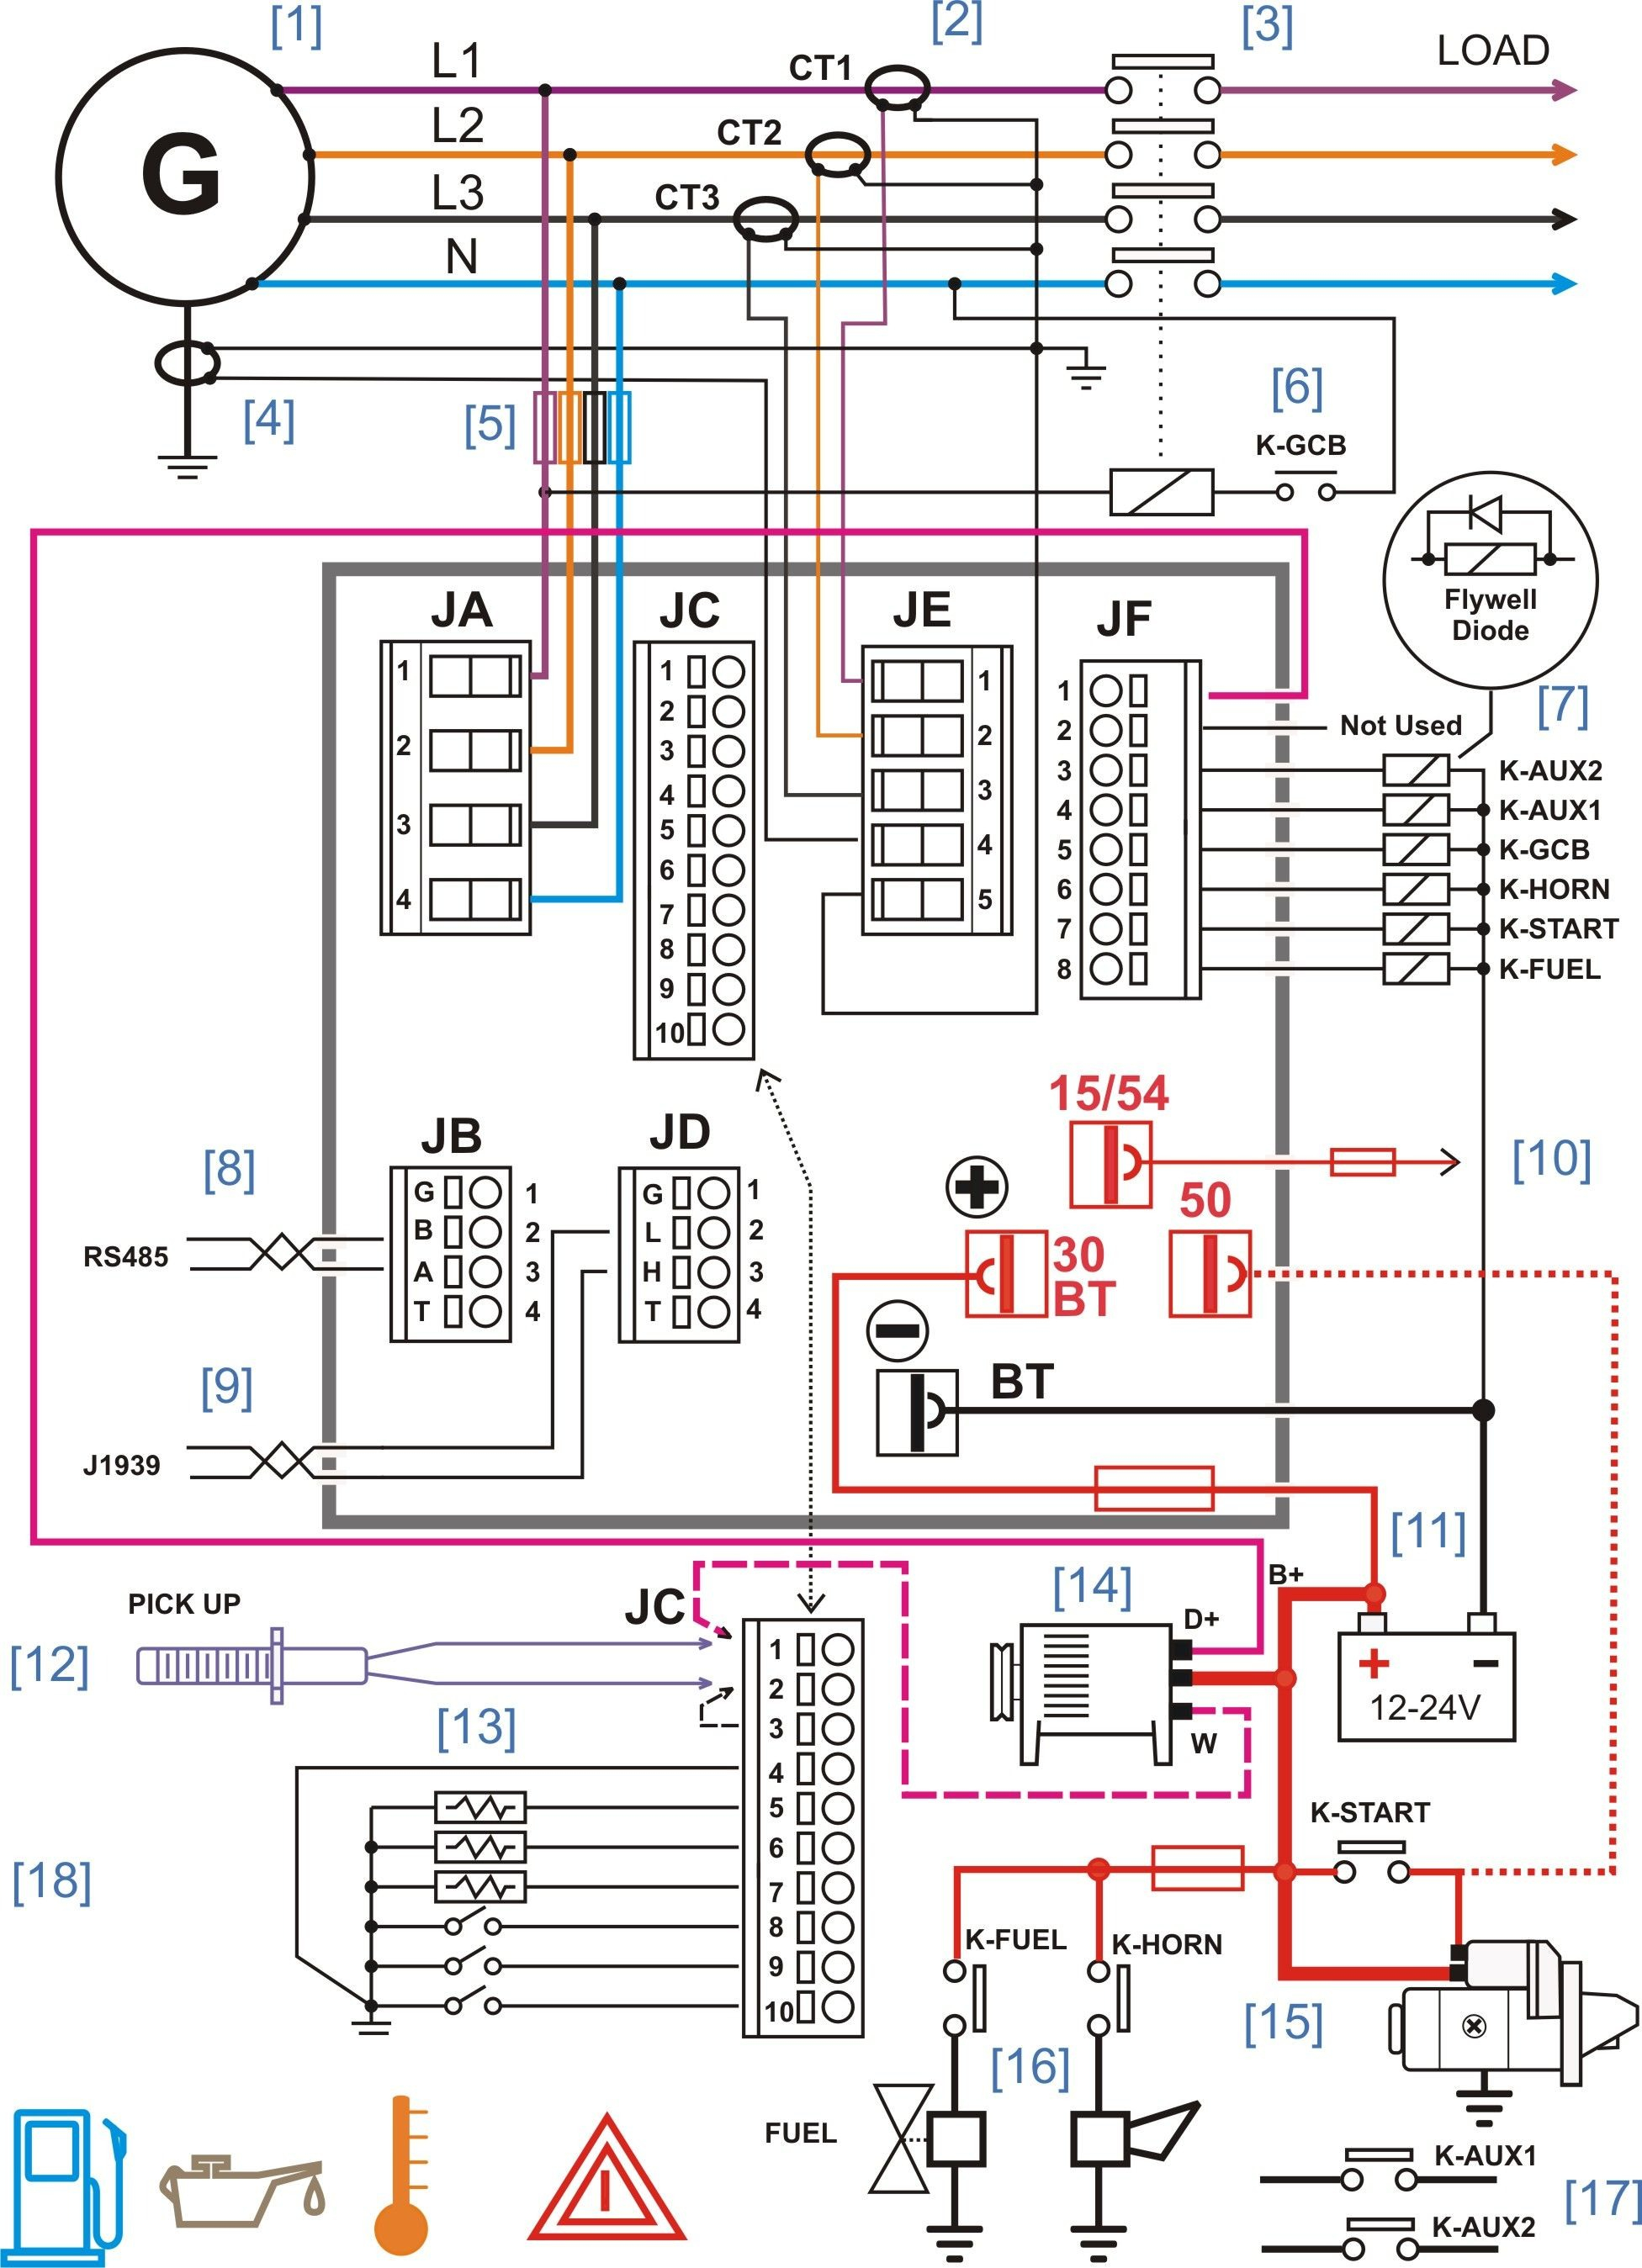 zoeller duplex pump control panel wiring diagram three port valve free download oasis dl co orenco diagrams schematics myers at